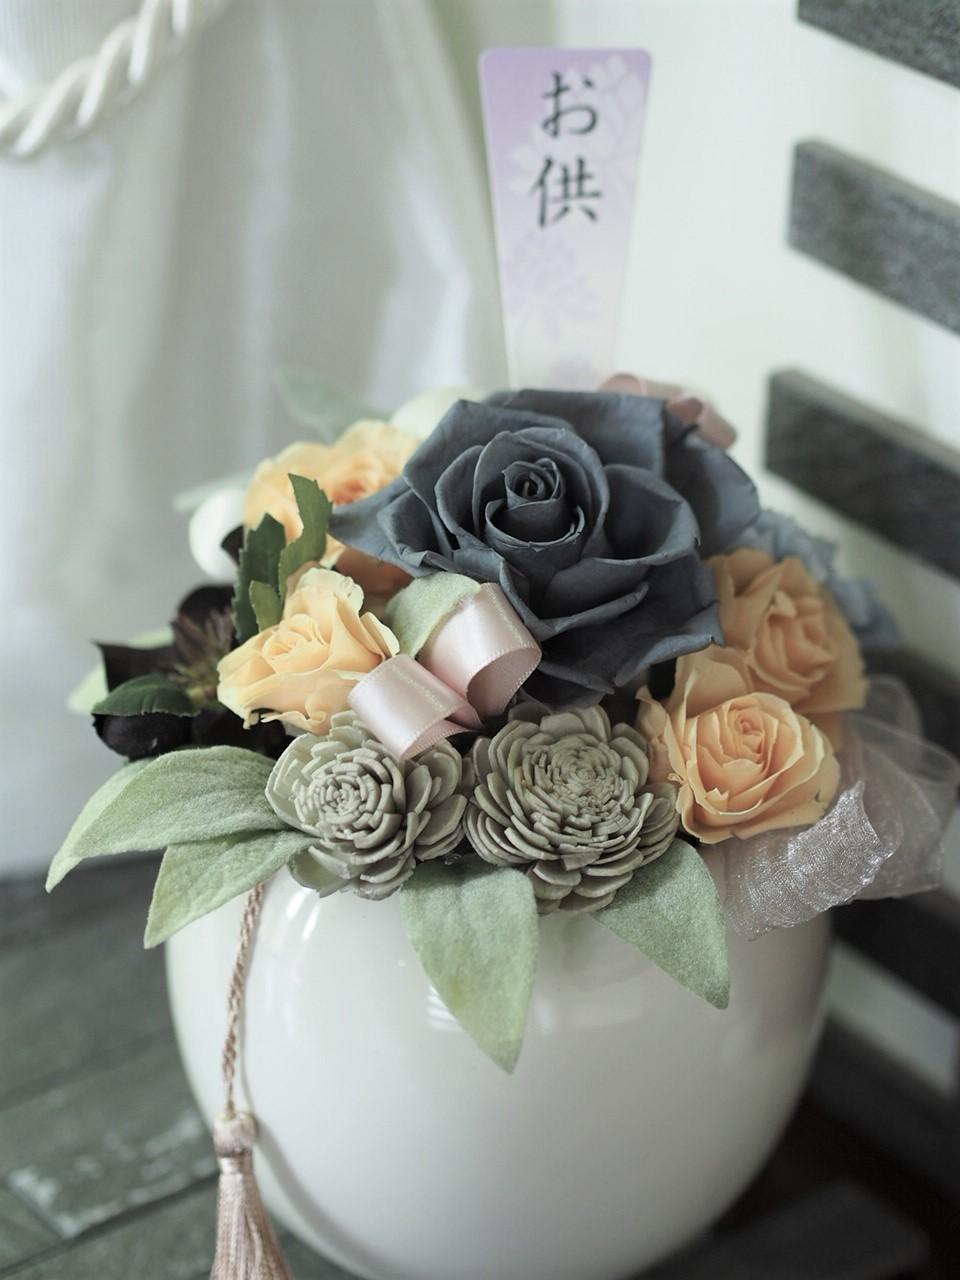 新盆仏花 亡き母上様へ_d0144095_13221203.jpg